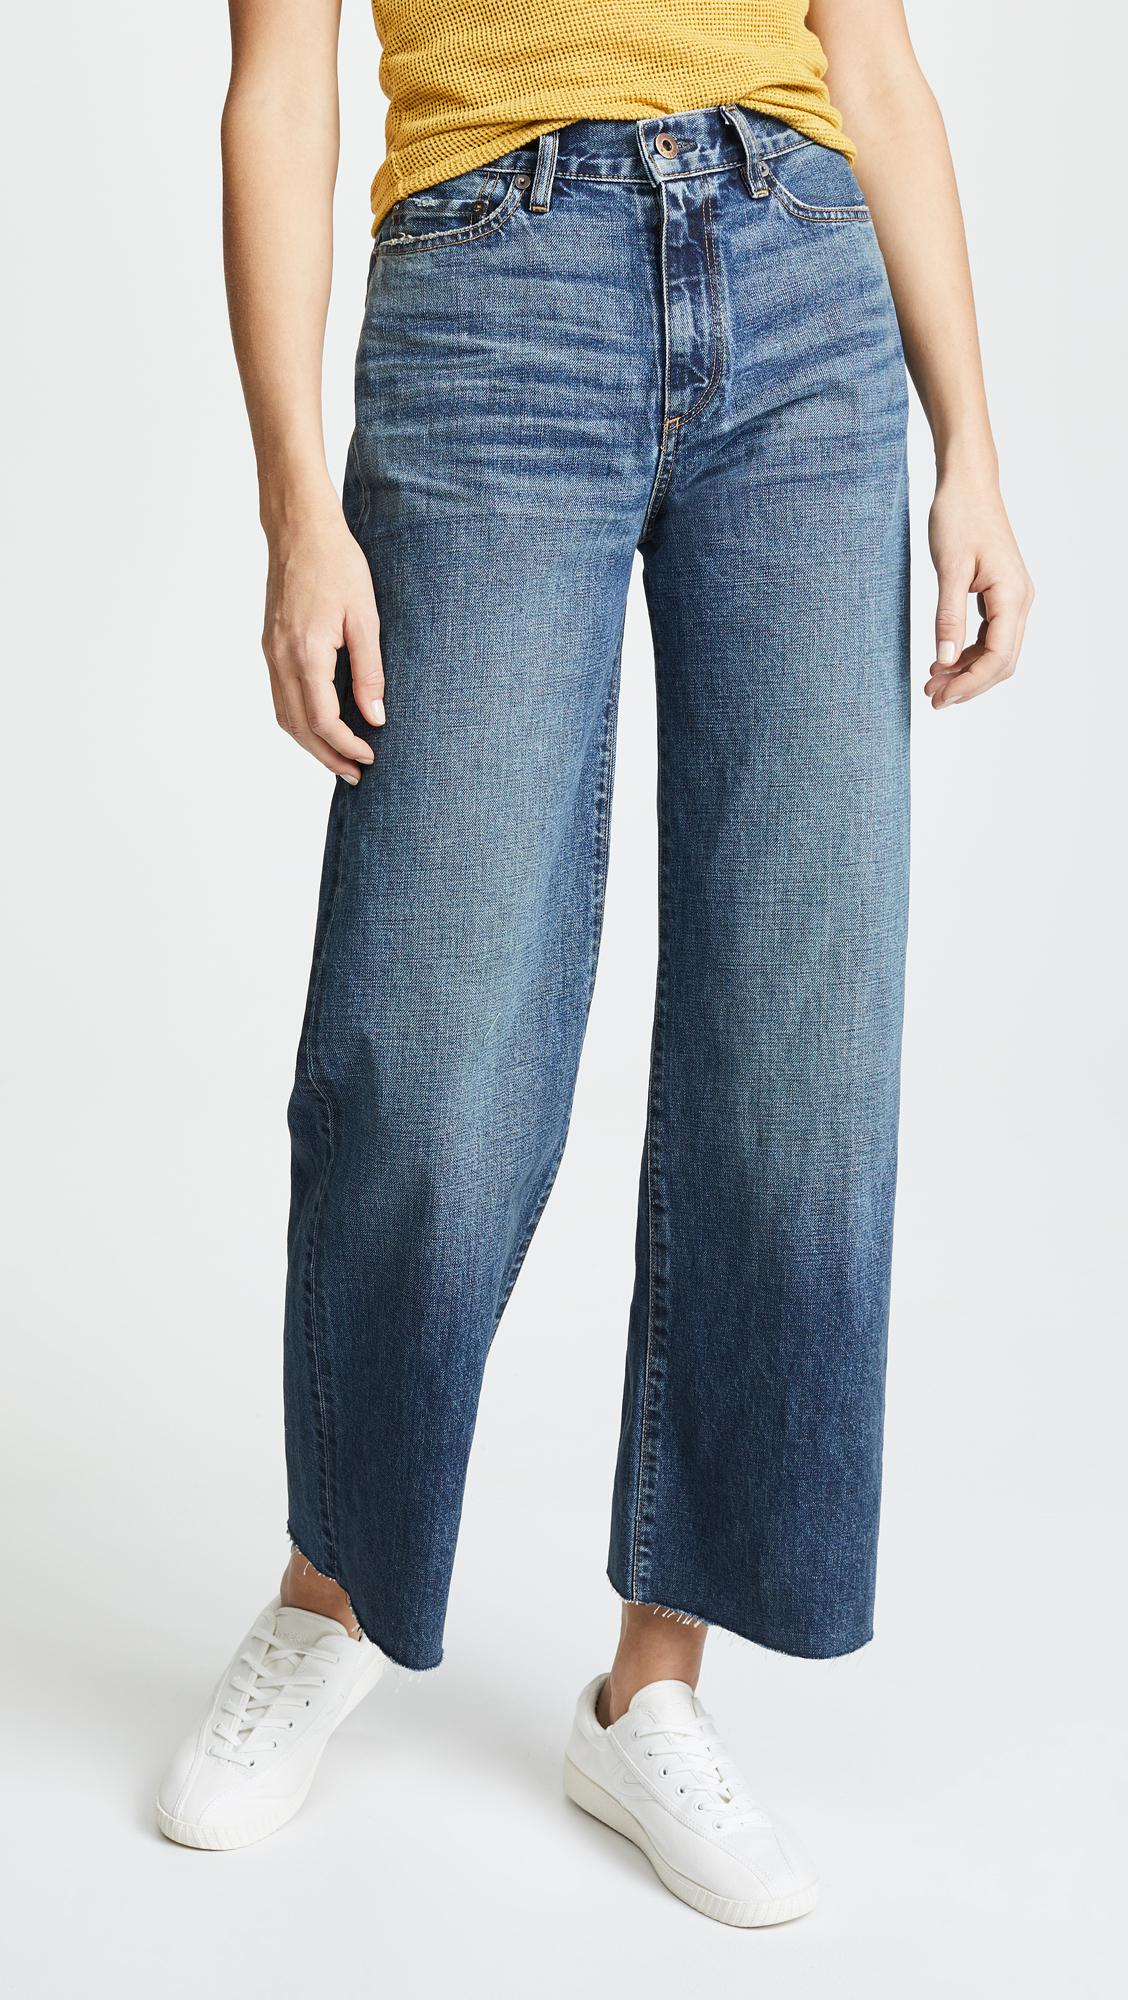 W006 Musa Mid-rise Wide-leg Jeans - Dark denim Simon Miller Shop Offer Cheap Online Low Shipping Cheap Online Buy Cheap 100% Original uivyTa